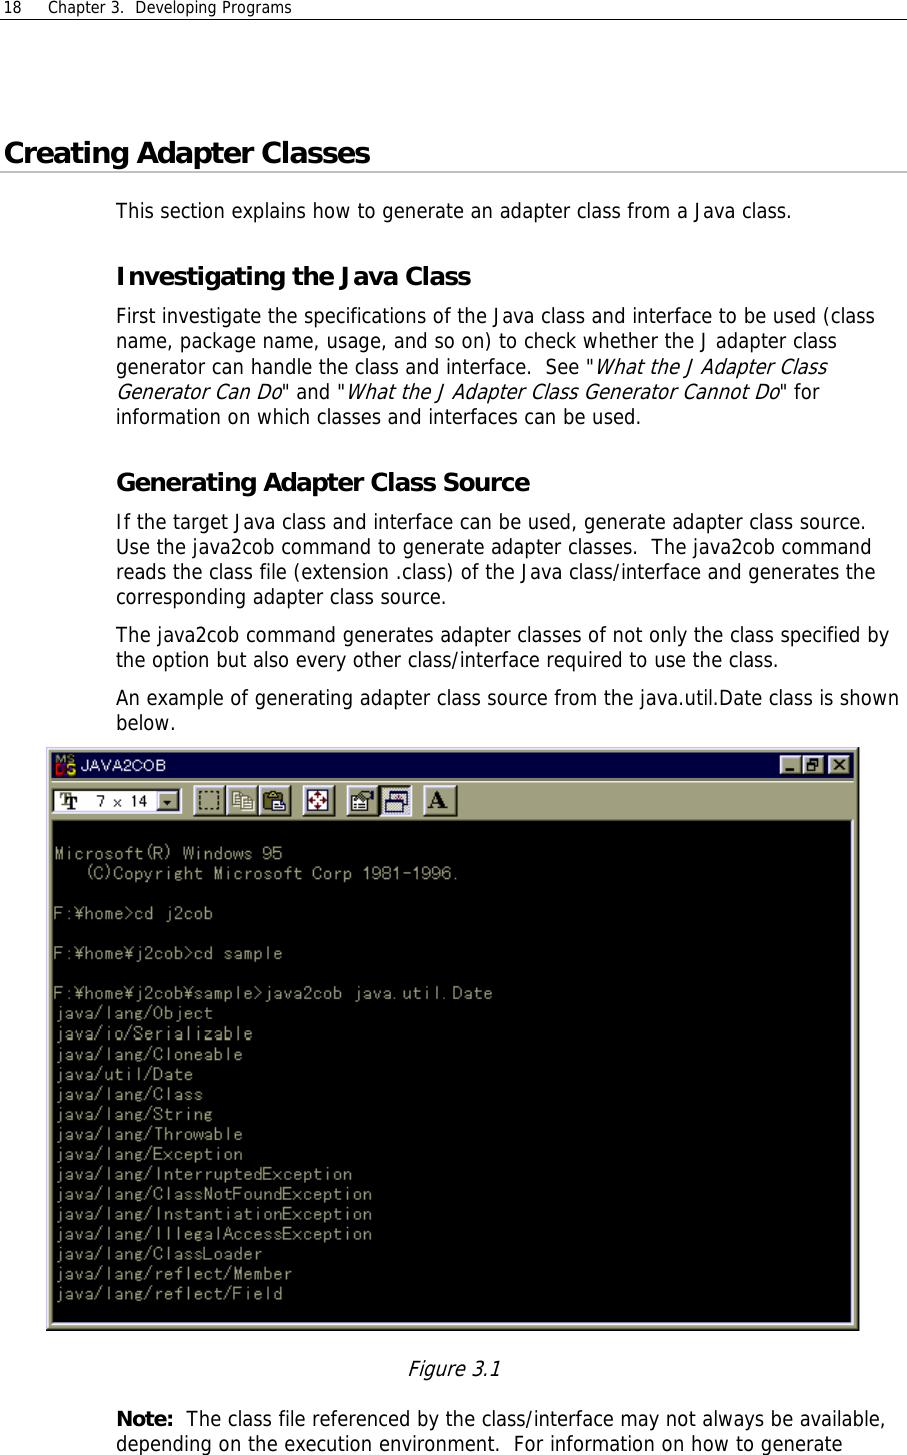 Fujitsu J Adapter Class Generator Users Manual NetCOBOL For